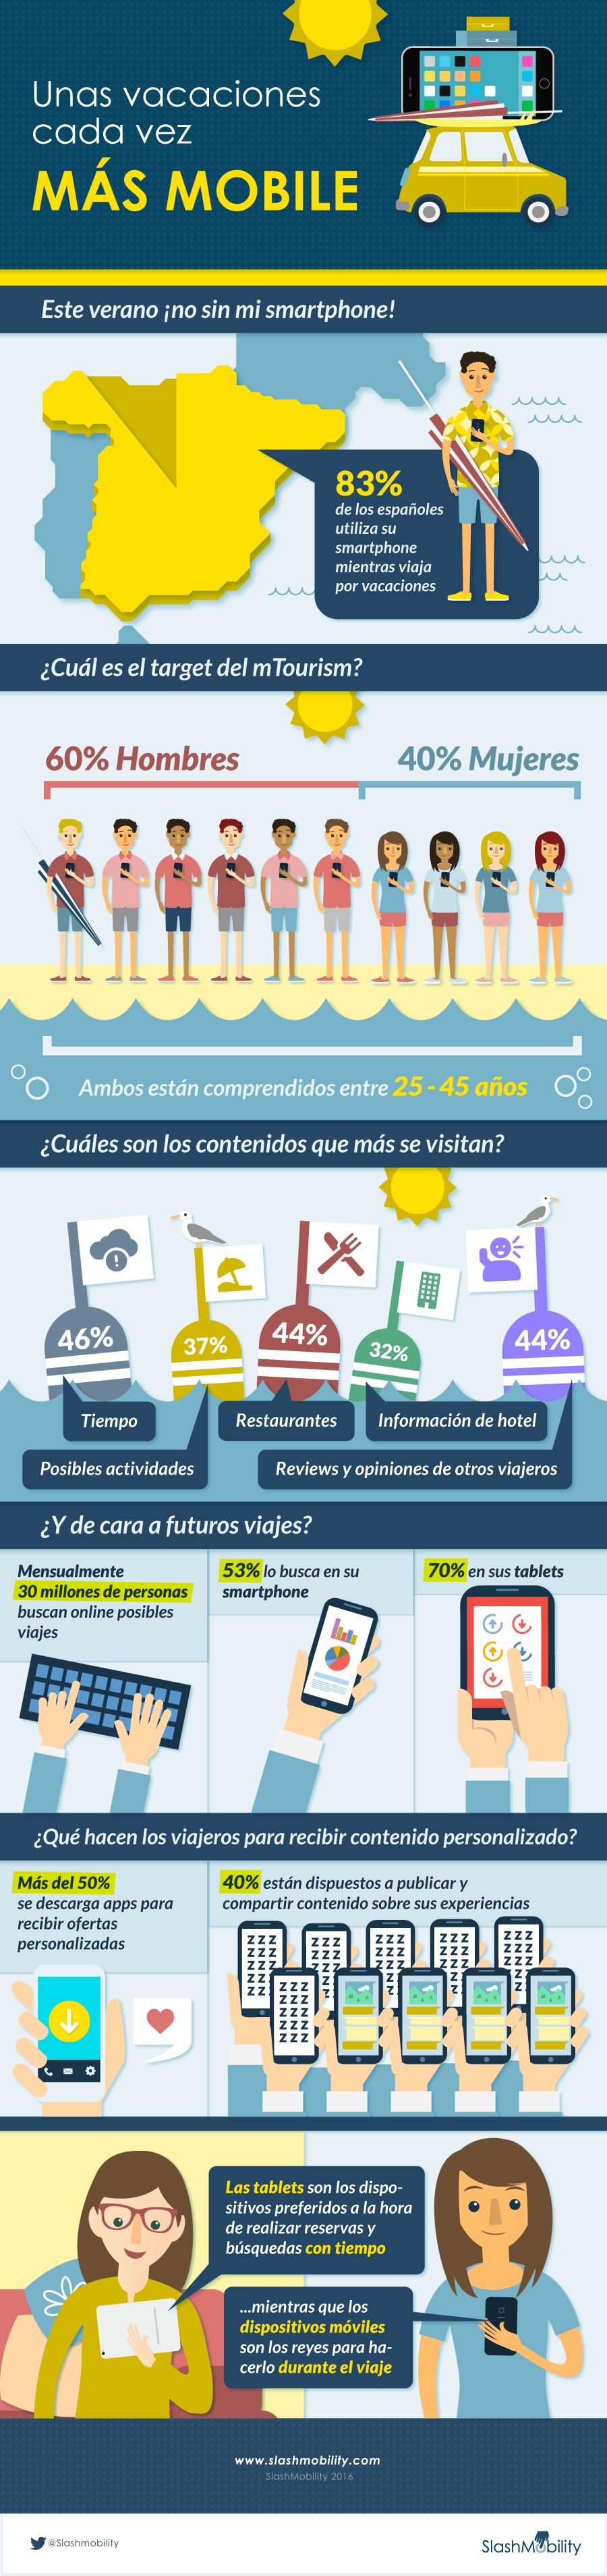 infografia-vacaciones-verano-smartphone